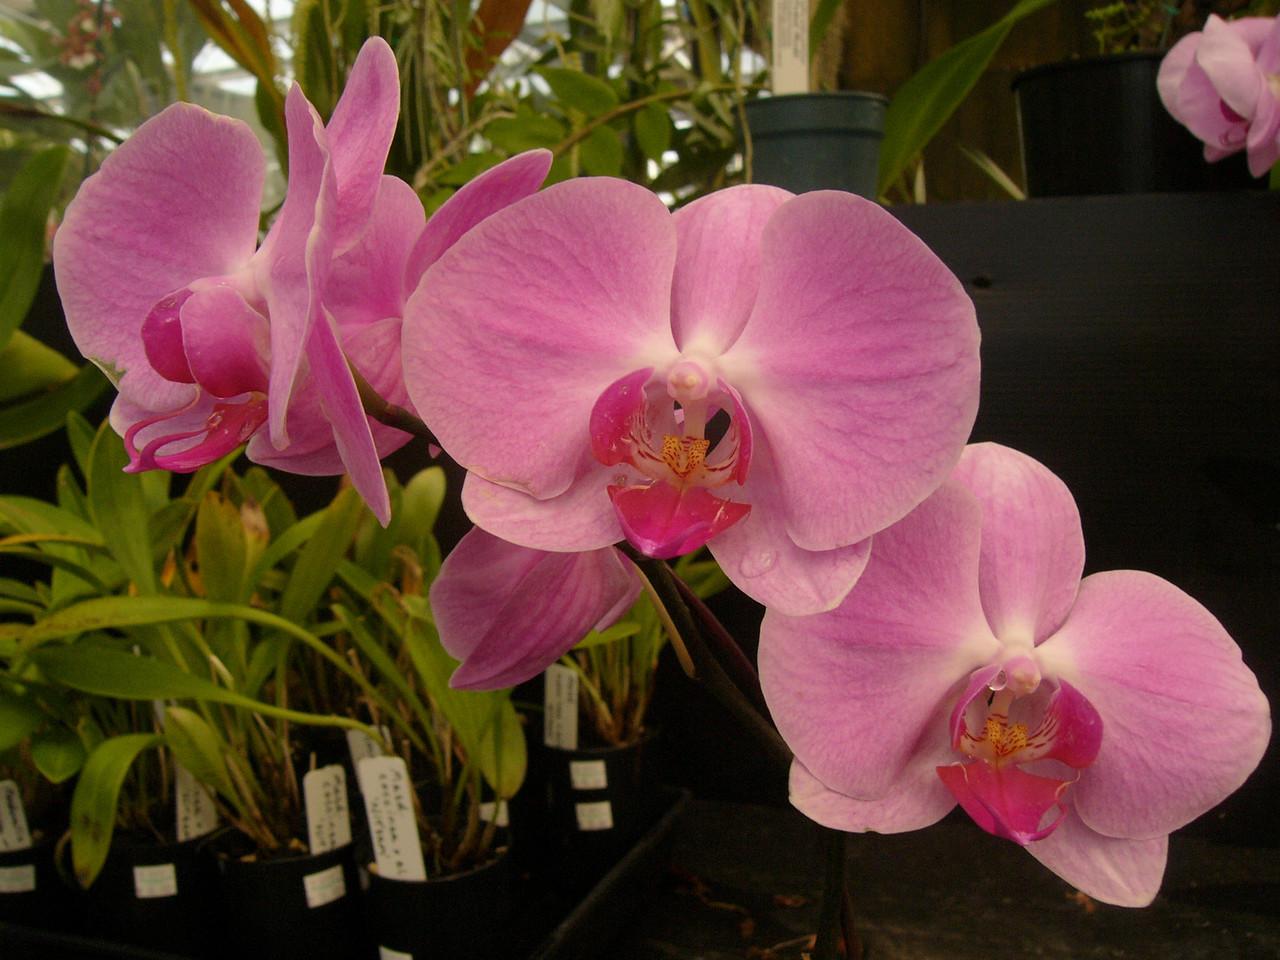 20070309_2597 Orchids